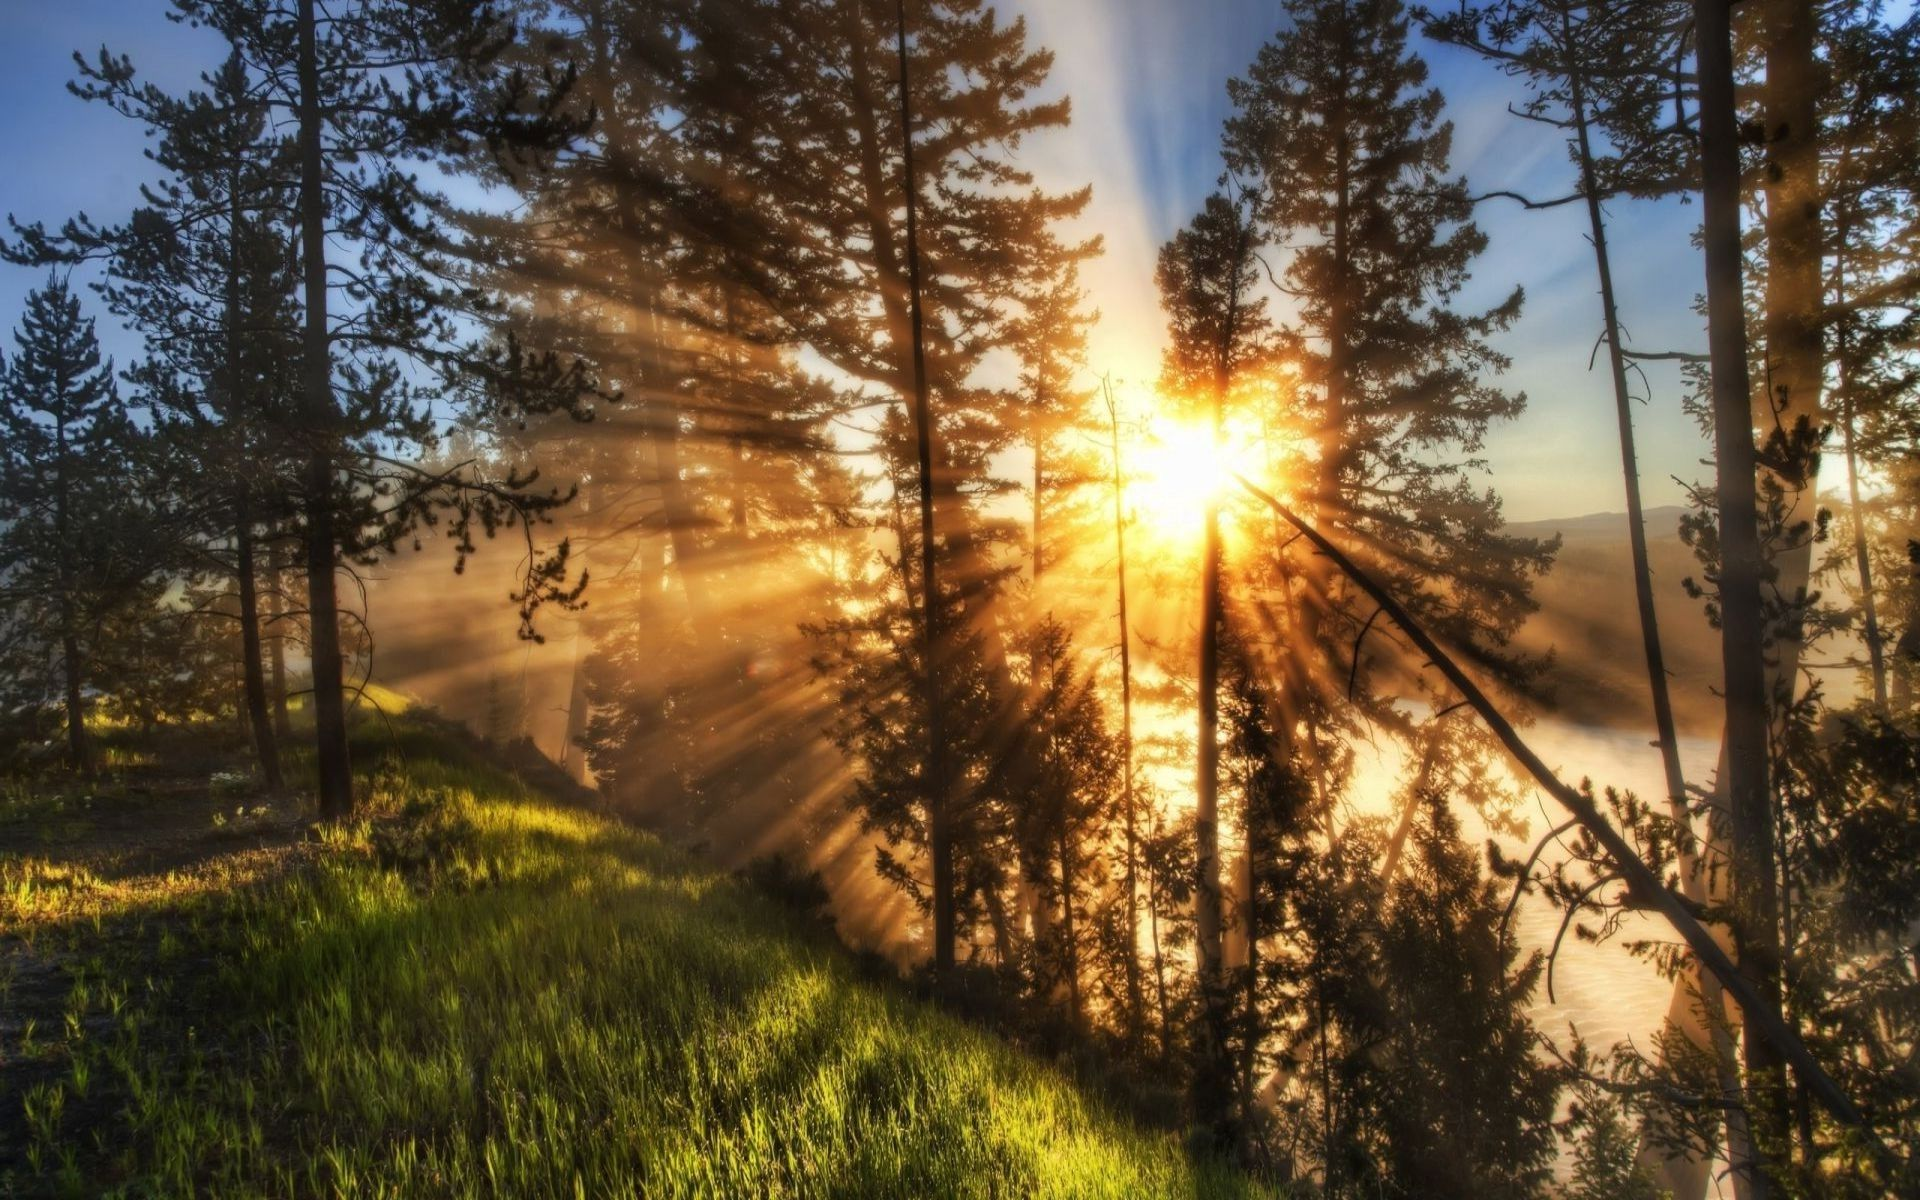 Sun through trees on hill | Nature wallpaper, Beautiful sunset